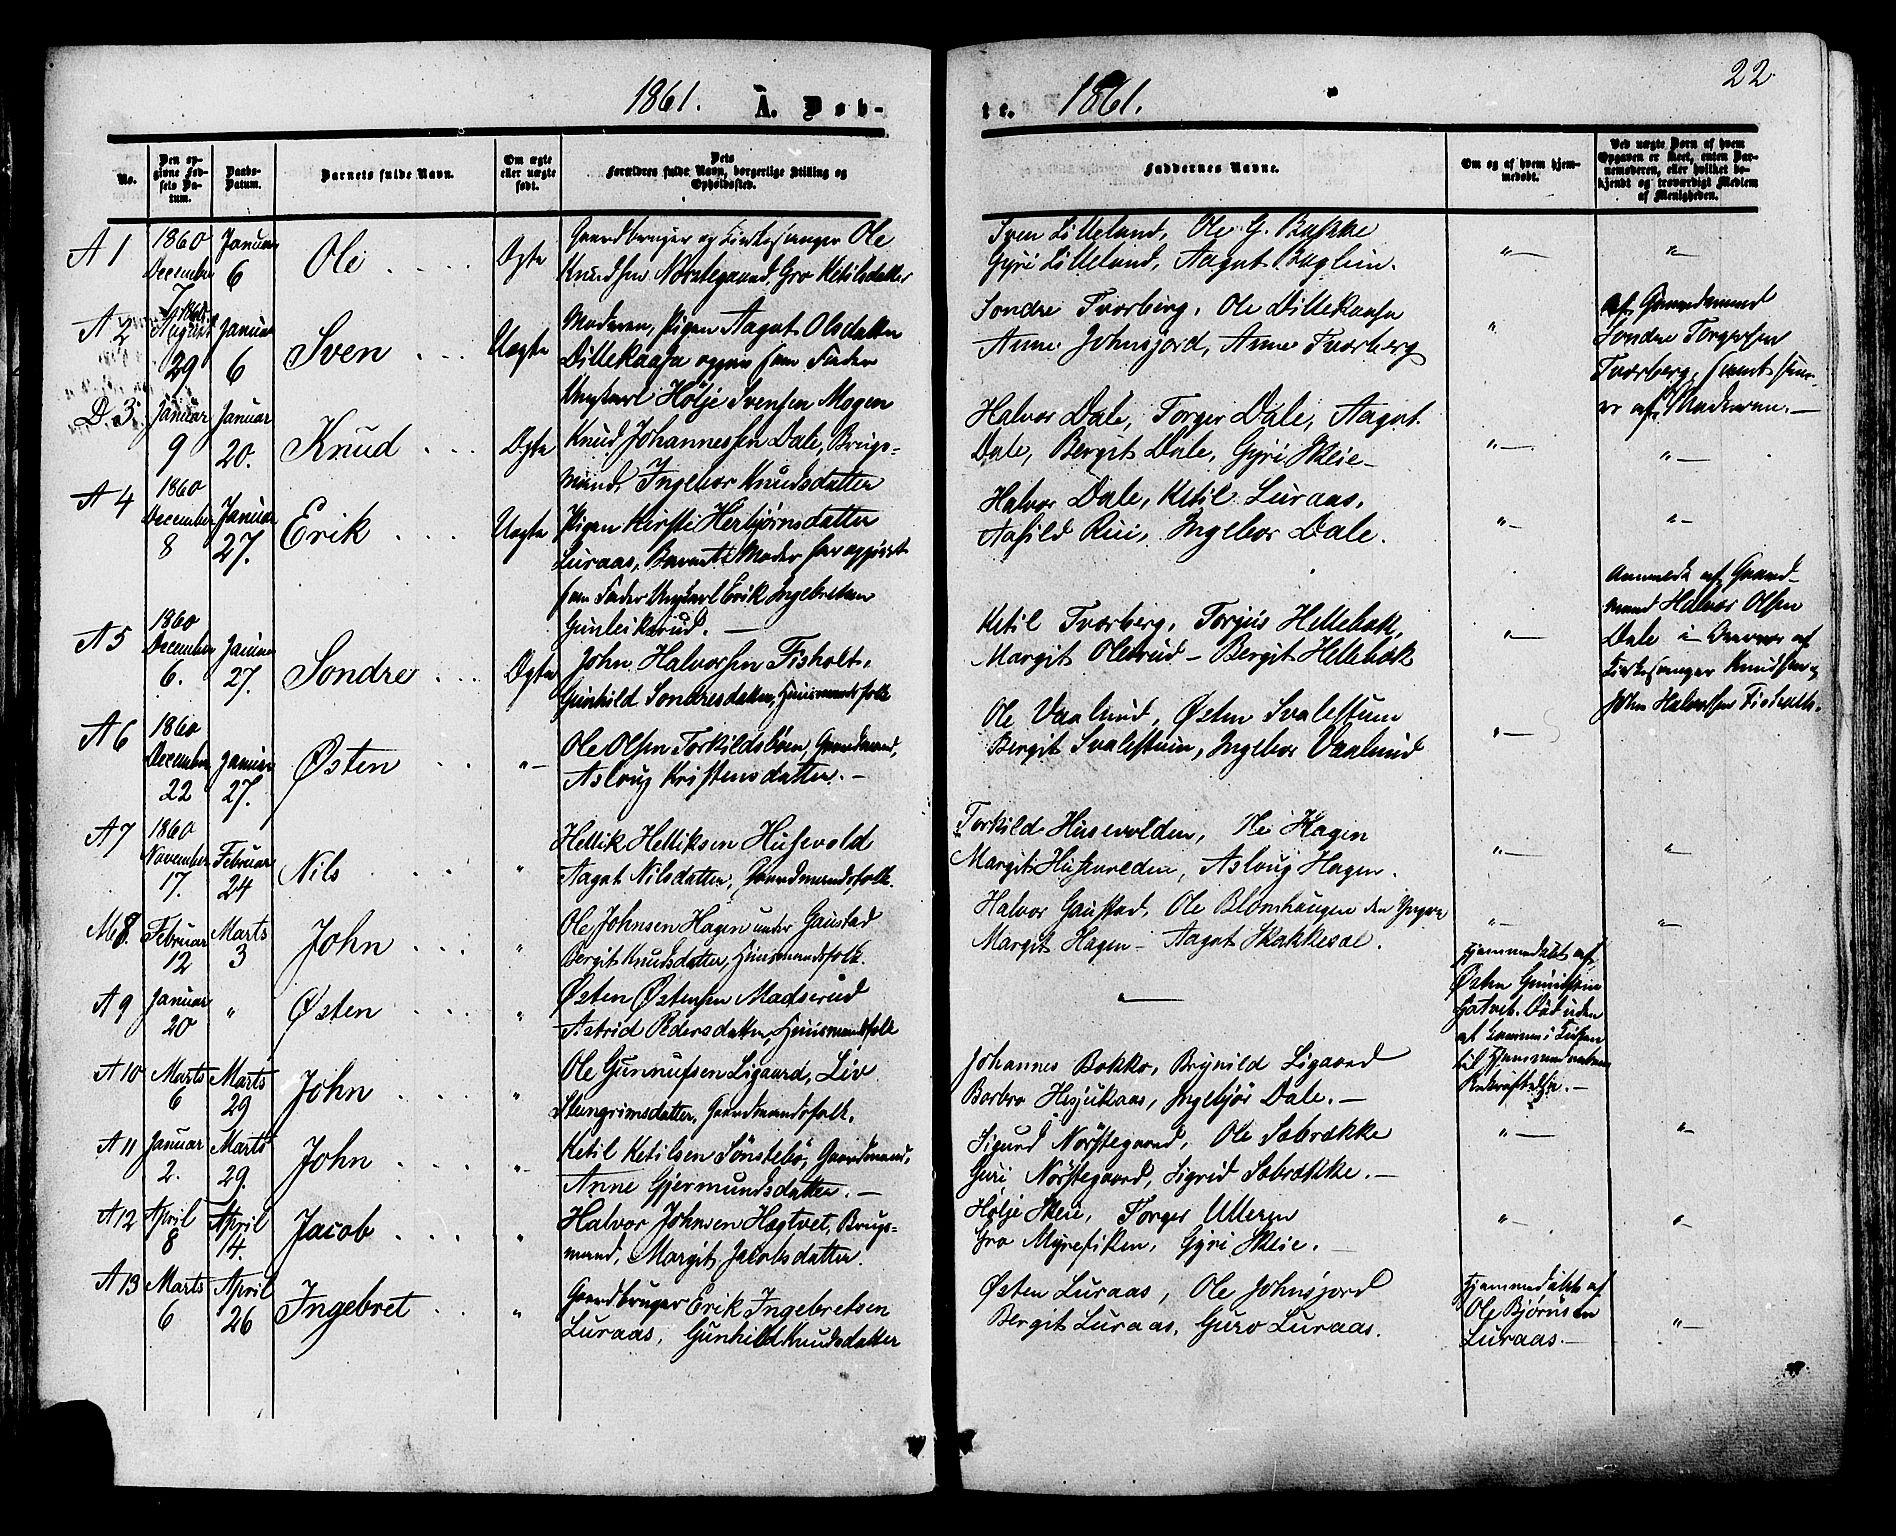 SAKO, Tinn kirkebøker, F/Fa/L0006: Ministerialbok nr. I 6, 1857-1878, s. 22